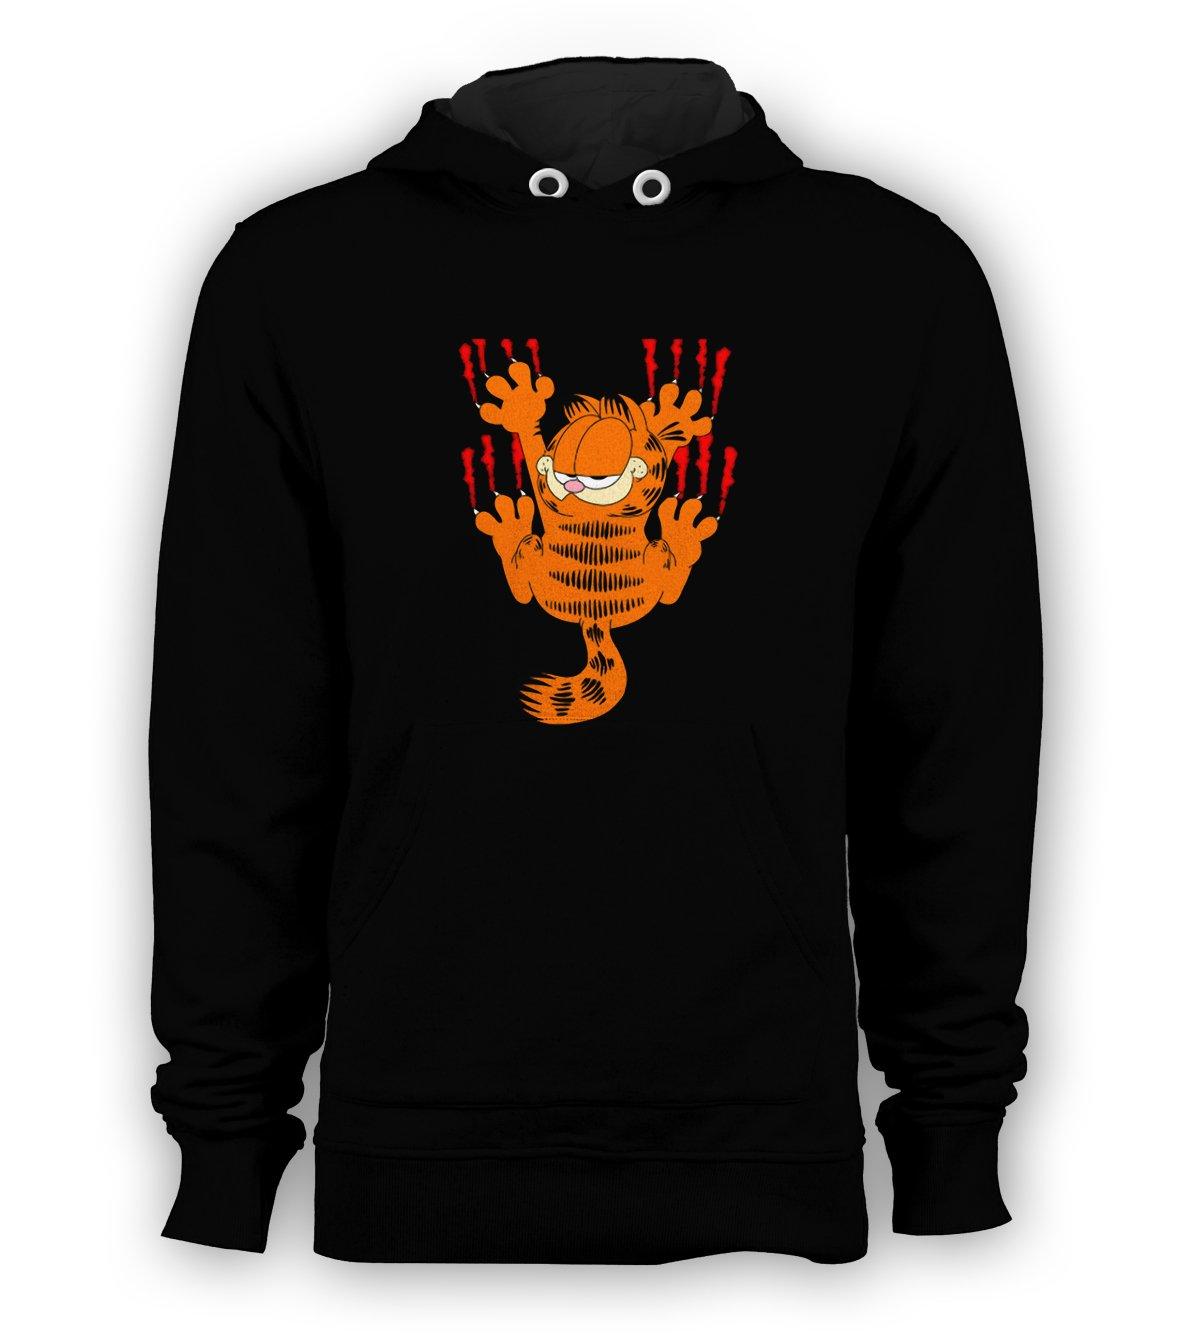 Garfield Pullover Hoodie Men Sweatshirts Size S to 3XL New Black